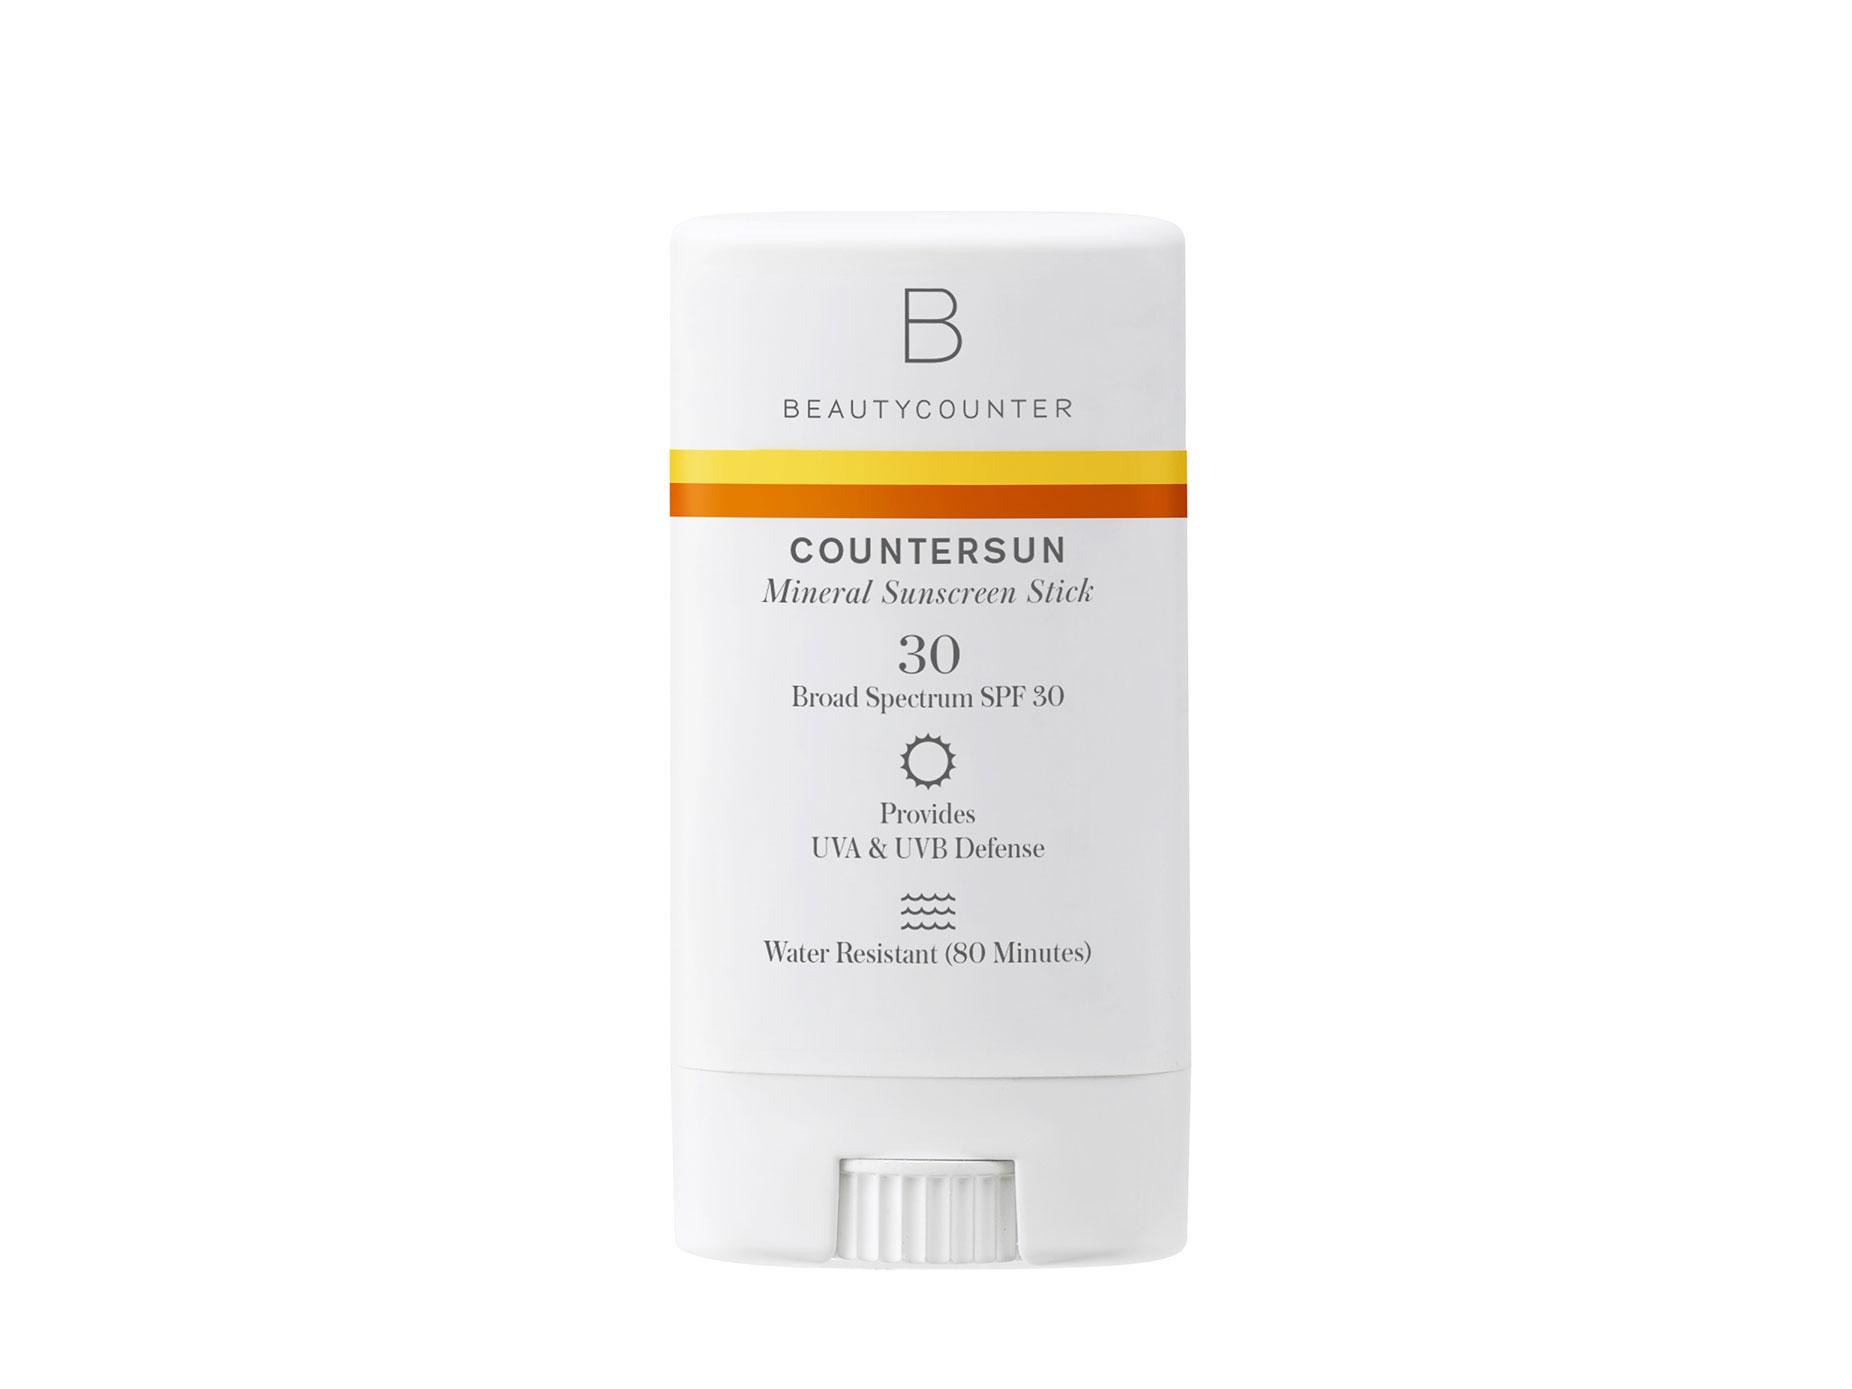 Beautycounter Countersun Mineral Sunscreen Stick SPF30, $20